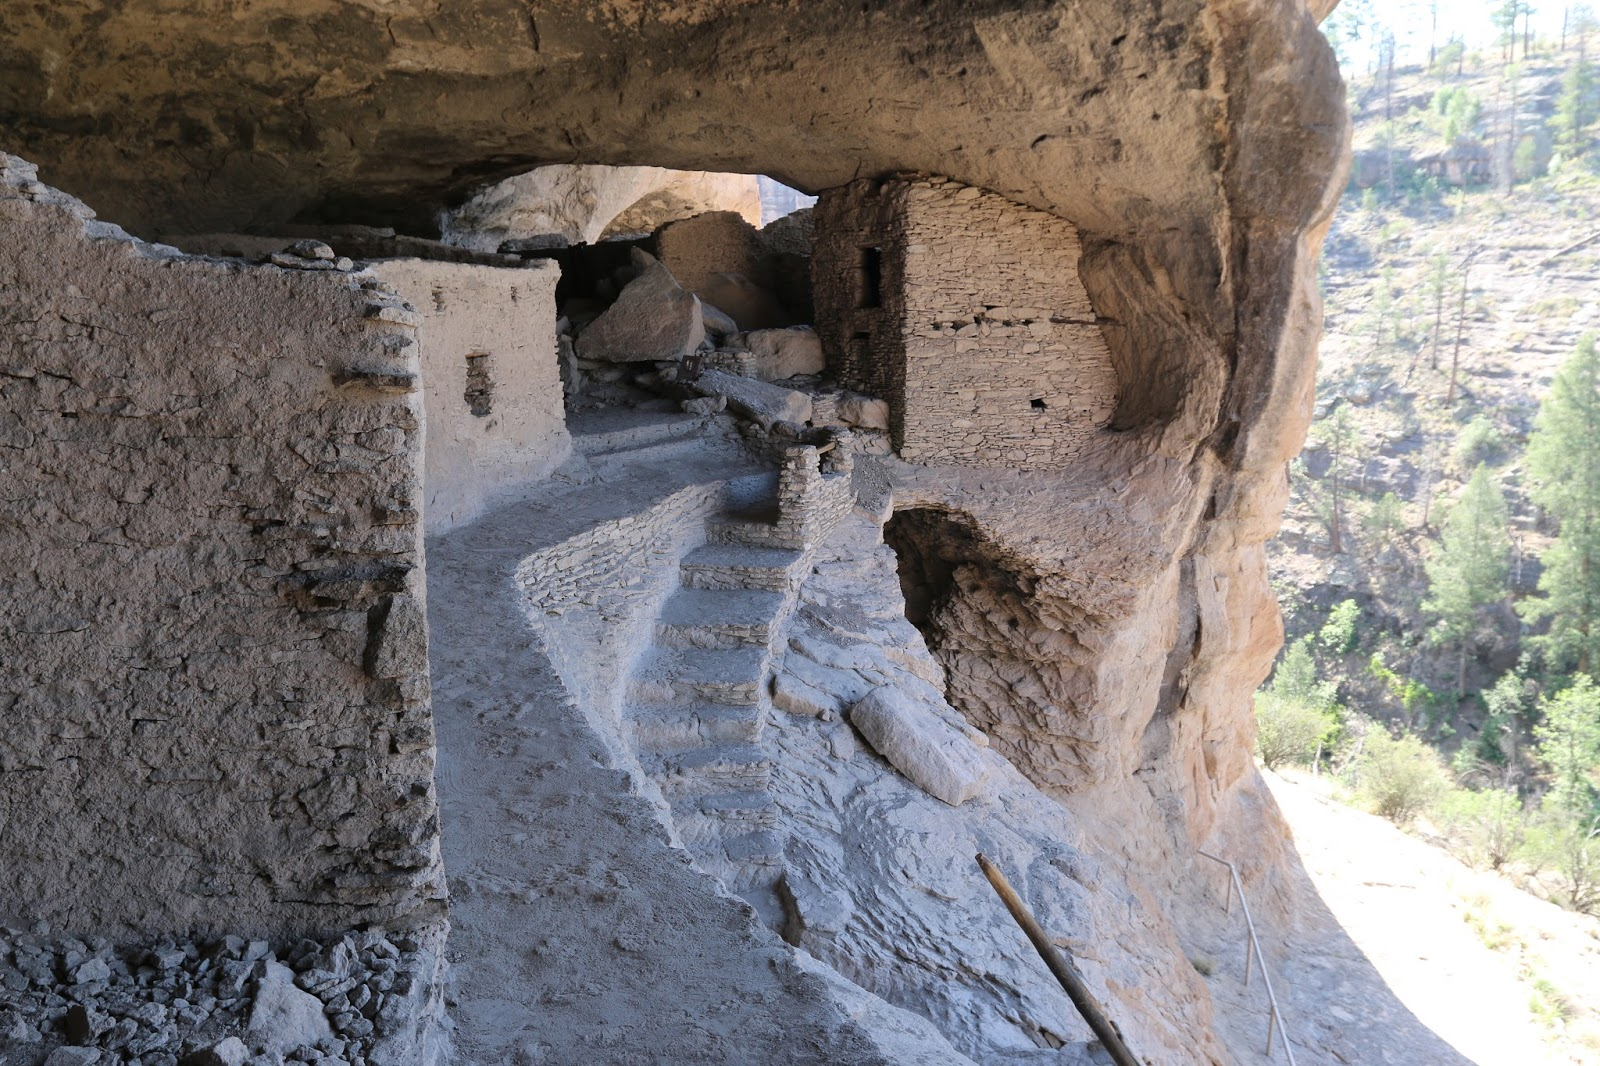 gjhikes com  gila cliff dwellings